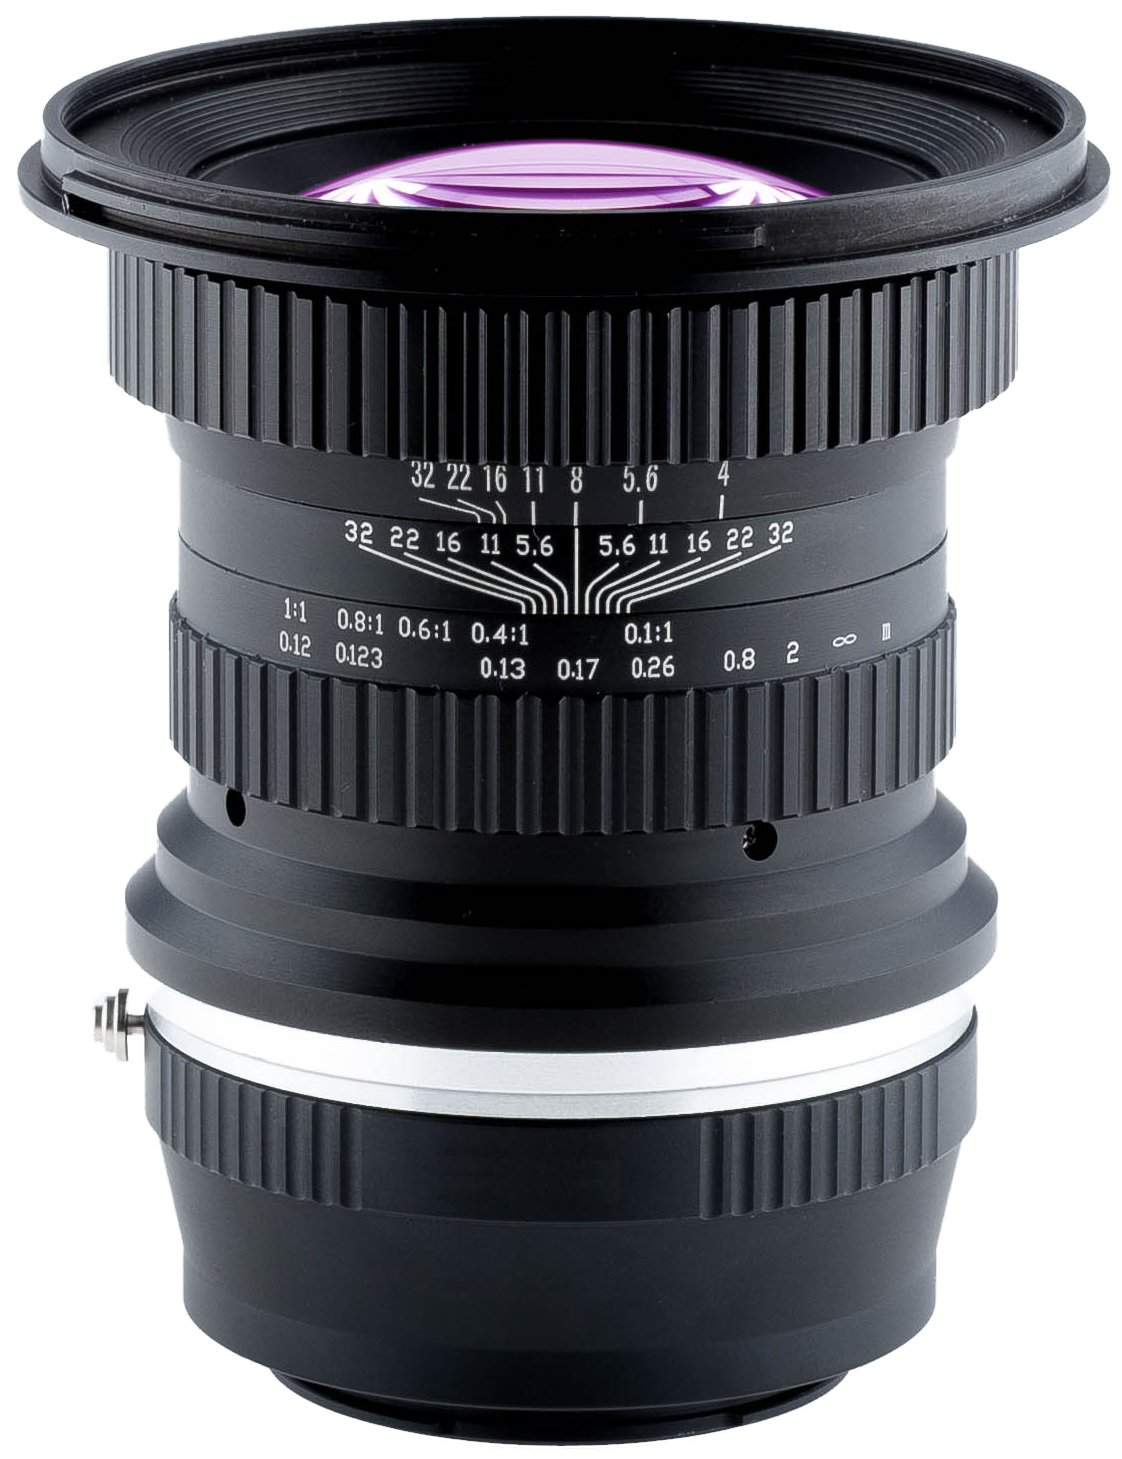 Opteka 15mm f/4 LD UNC AL 1:1 マクロ広角 フルフレーム レンズ パナソニック マイクロフォーサーズ デジタルカメラ用 (EOS-M43)   B01MRF6XJX